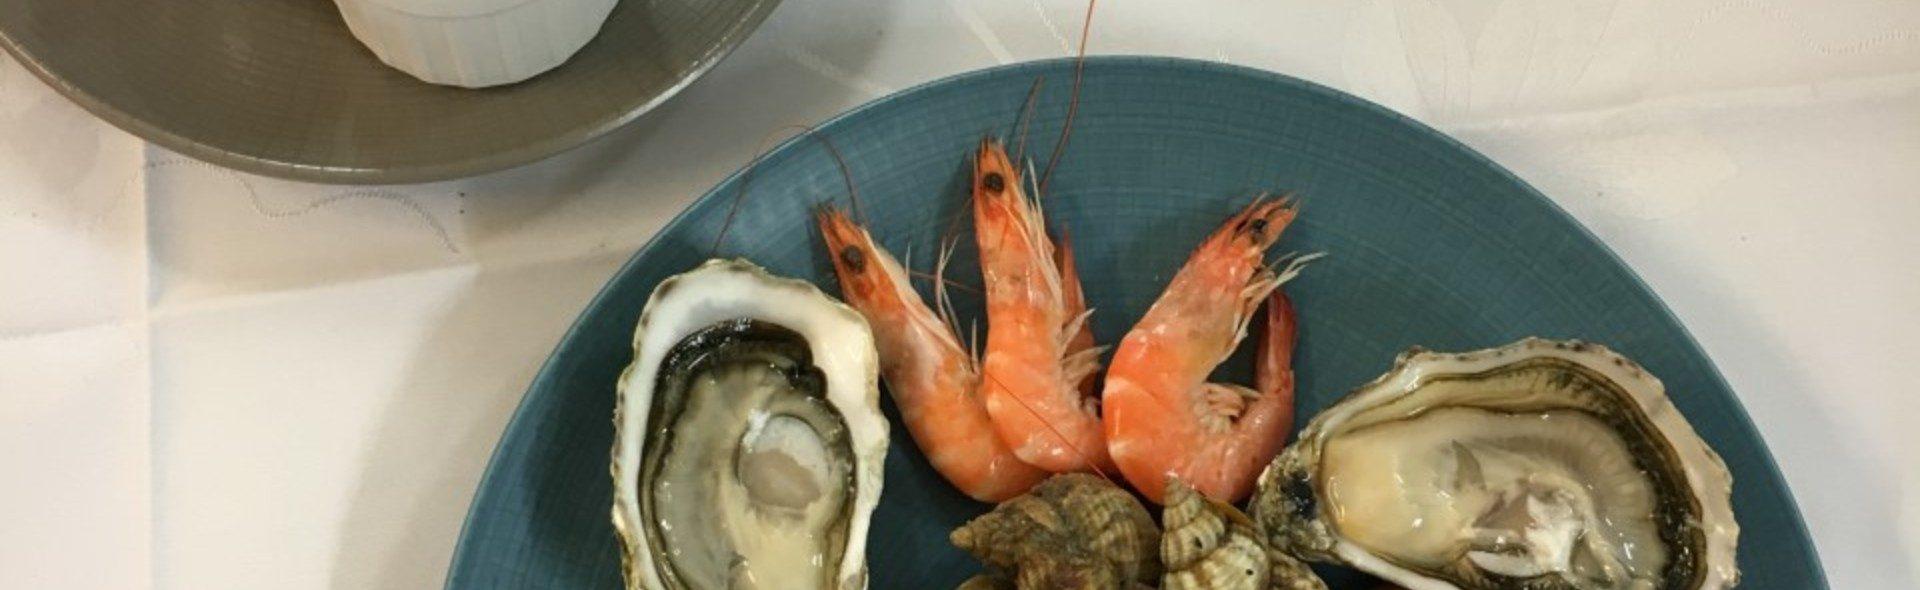 assortiment de fruits de mer